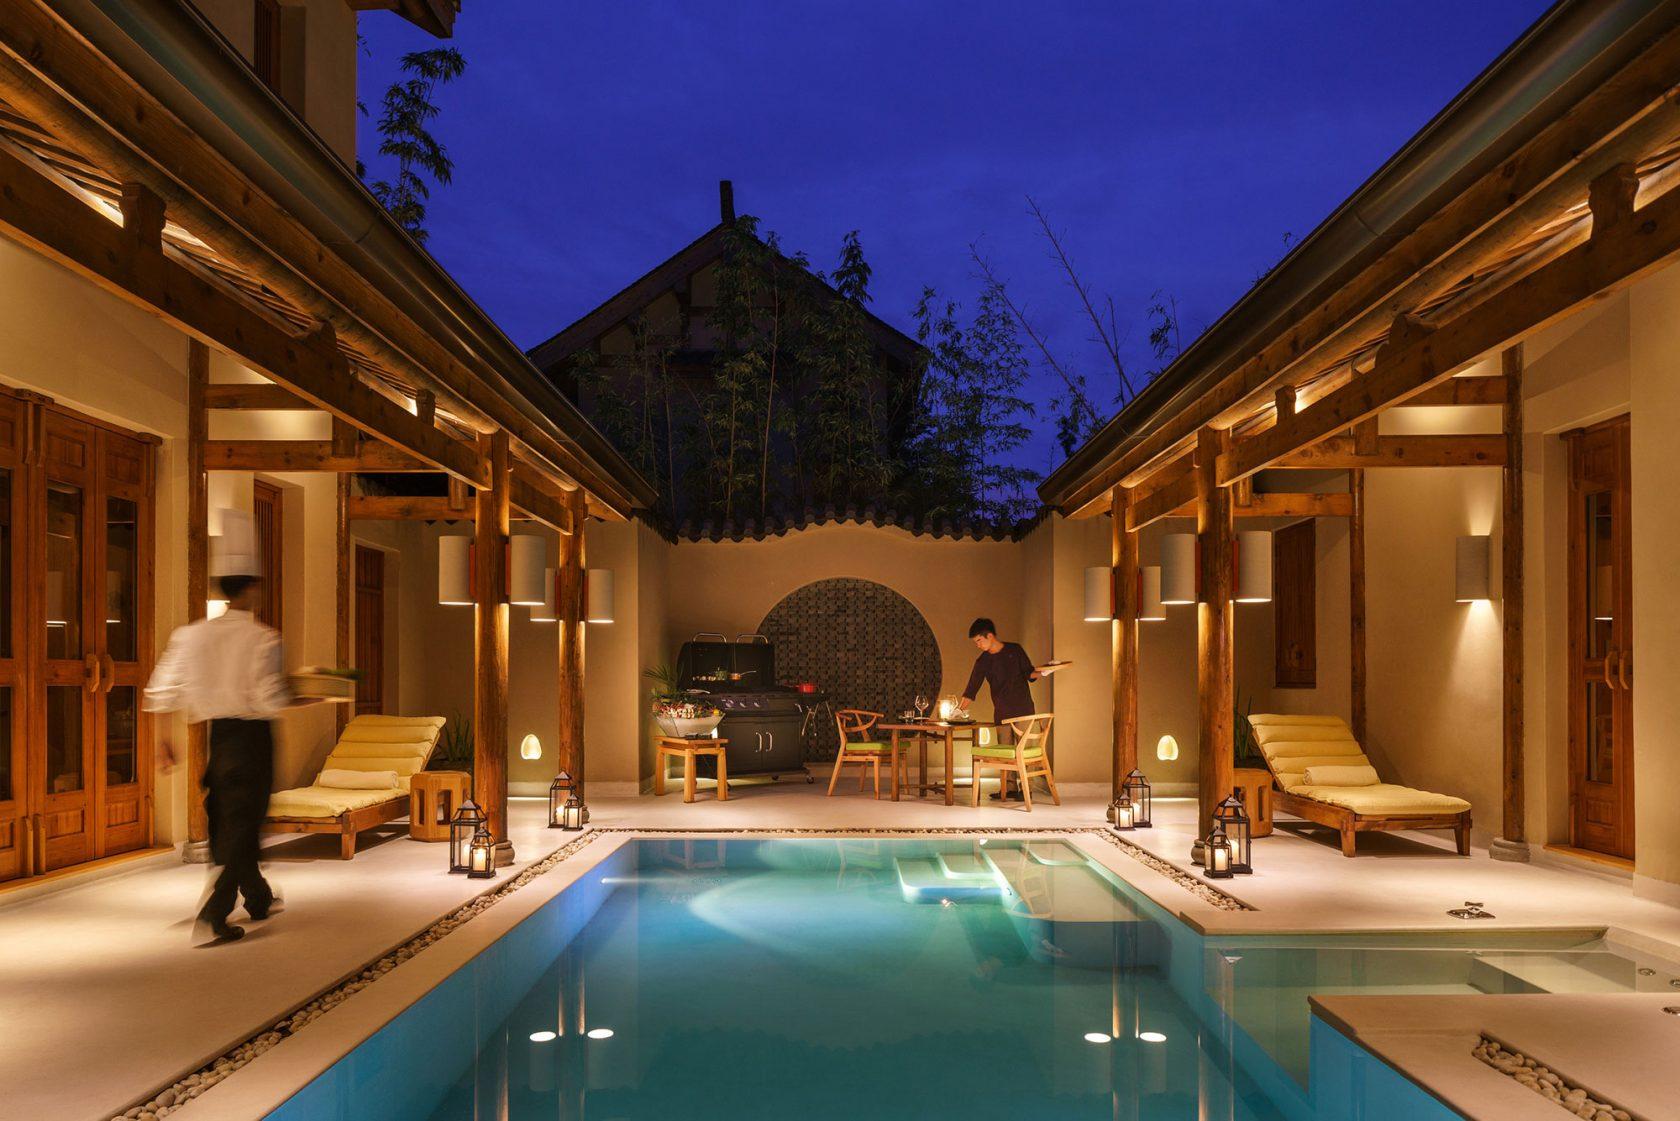 Six Senses Qing Cheng Mountain In Villa Barbecue